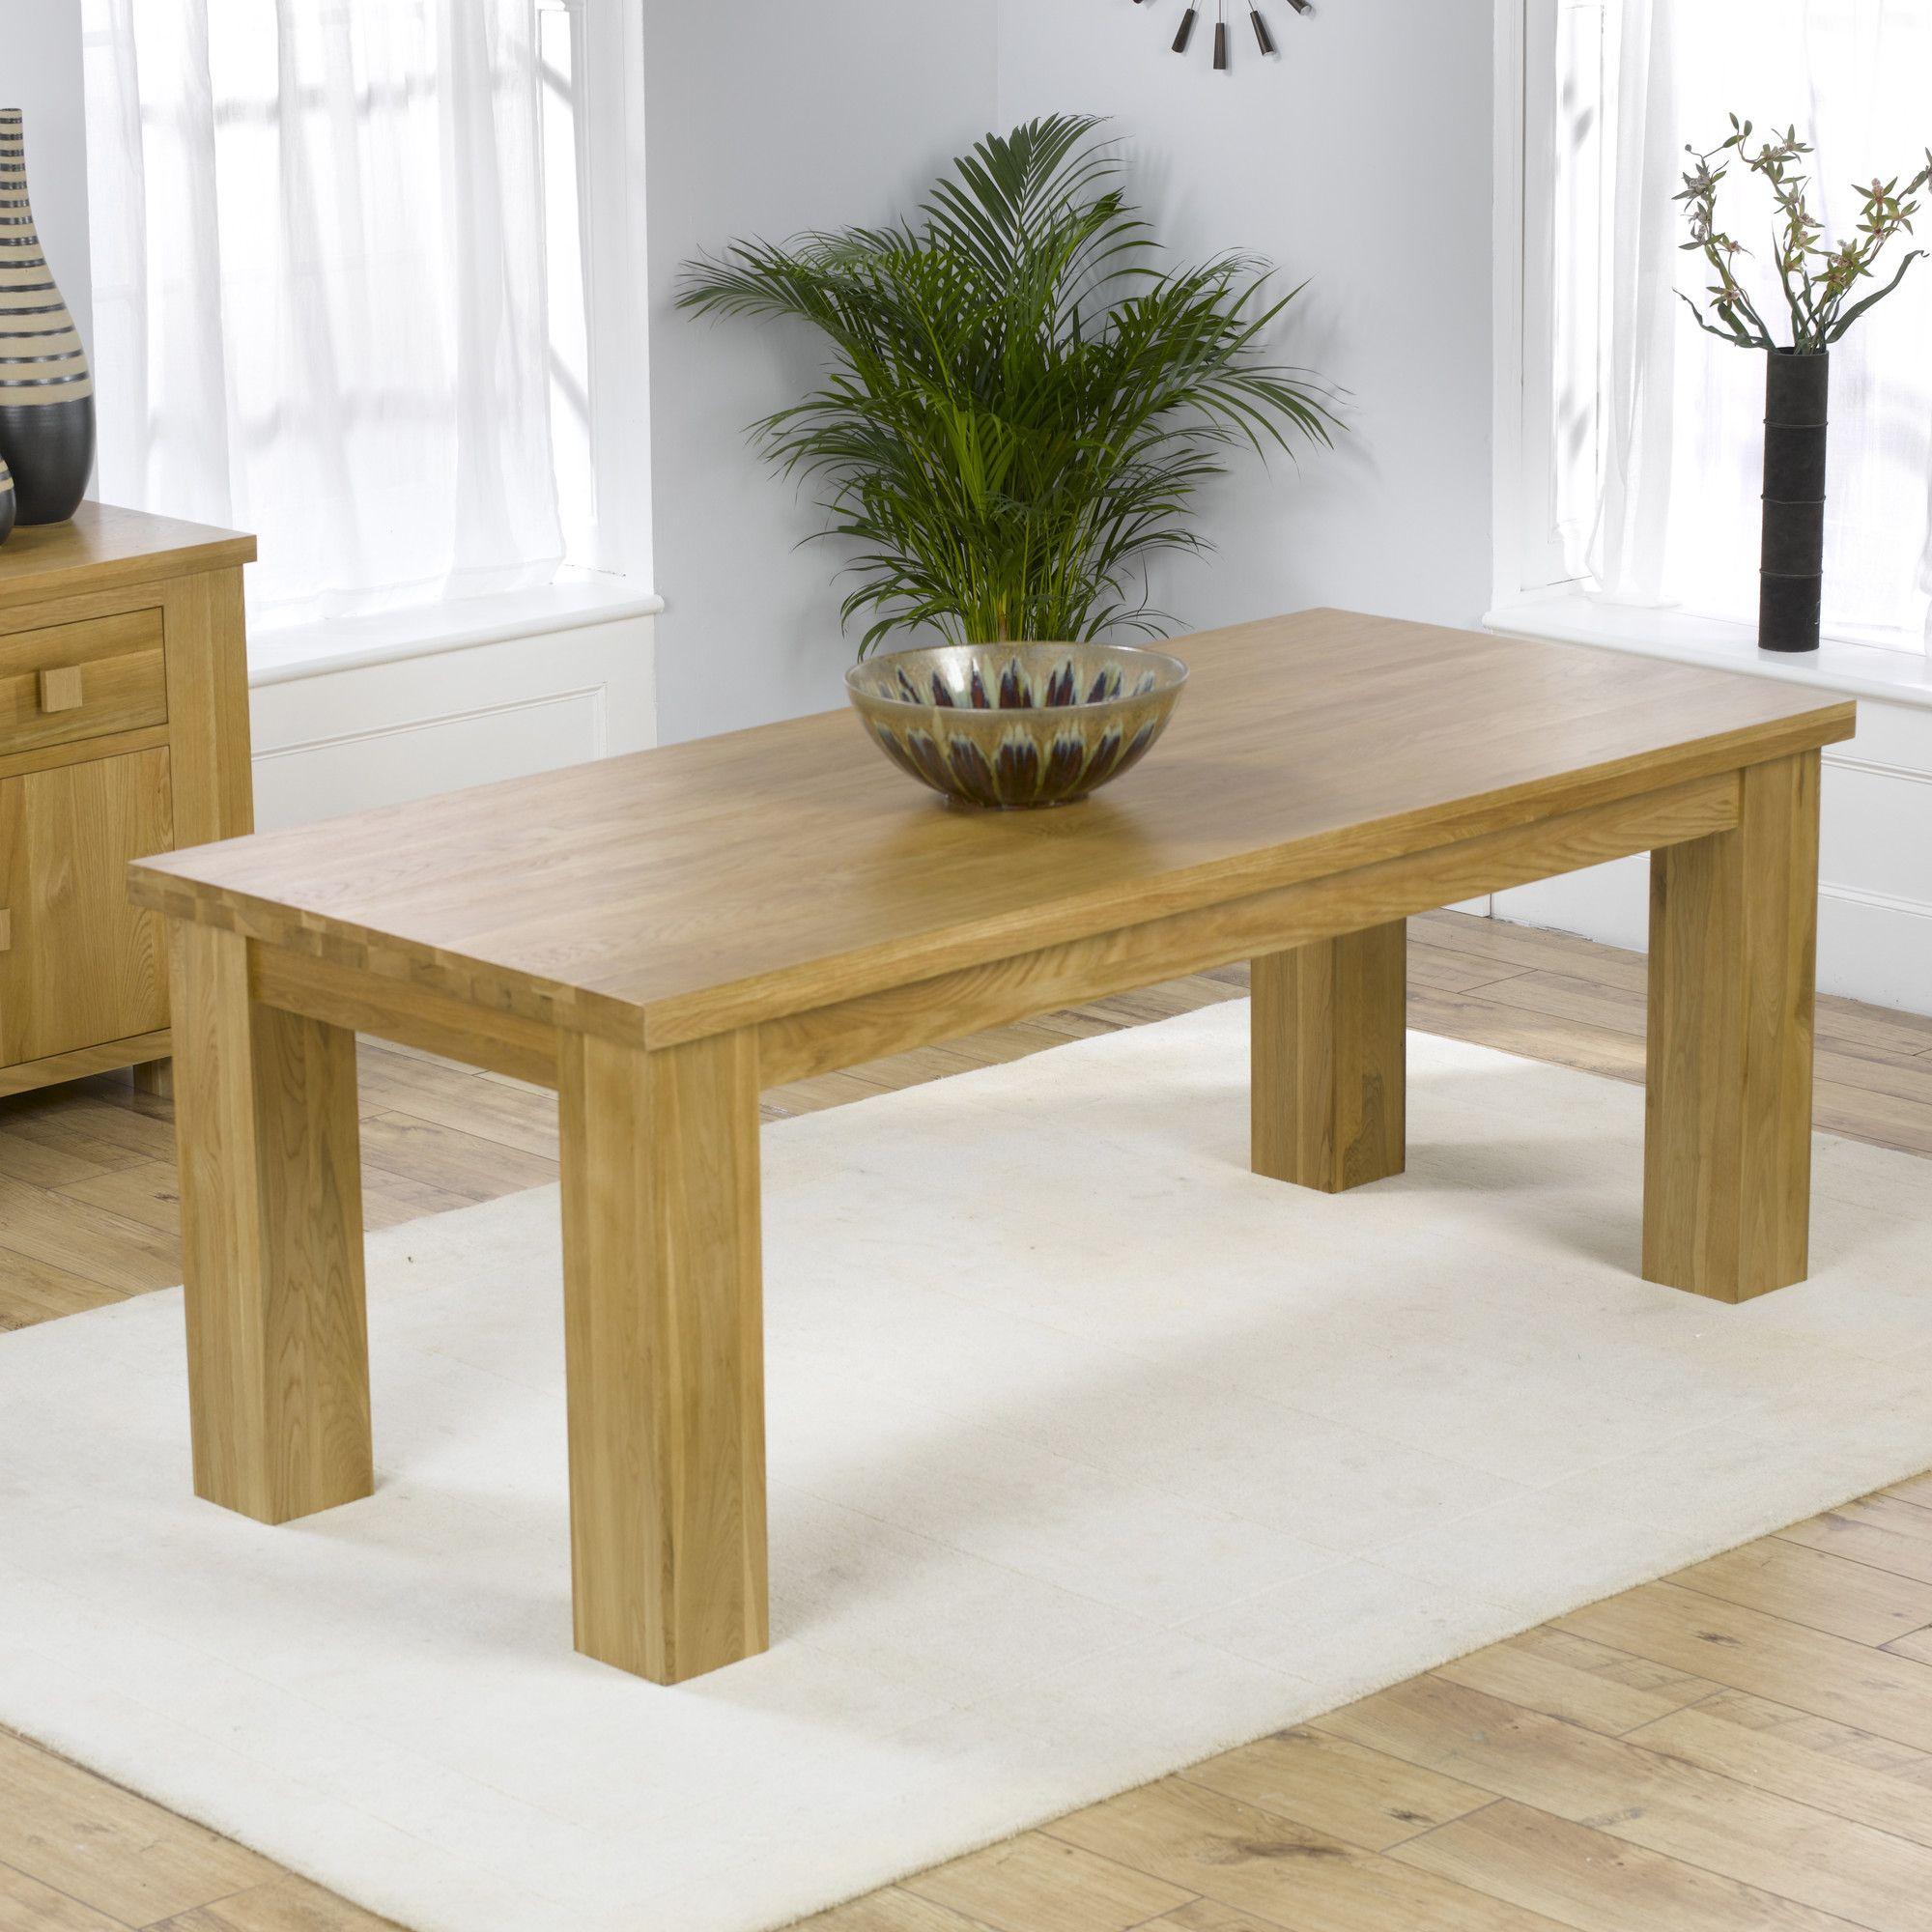 Mark Harris Furniture Barcelona Solid Oak Dining Table - 150 cm